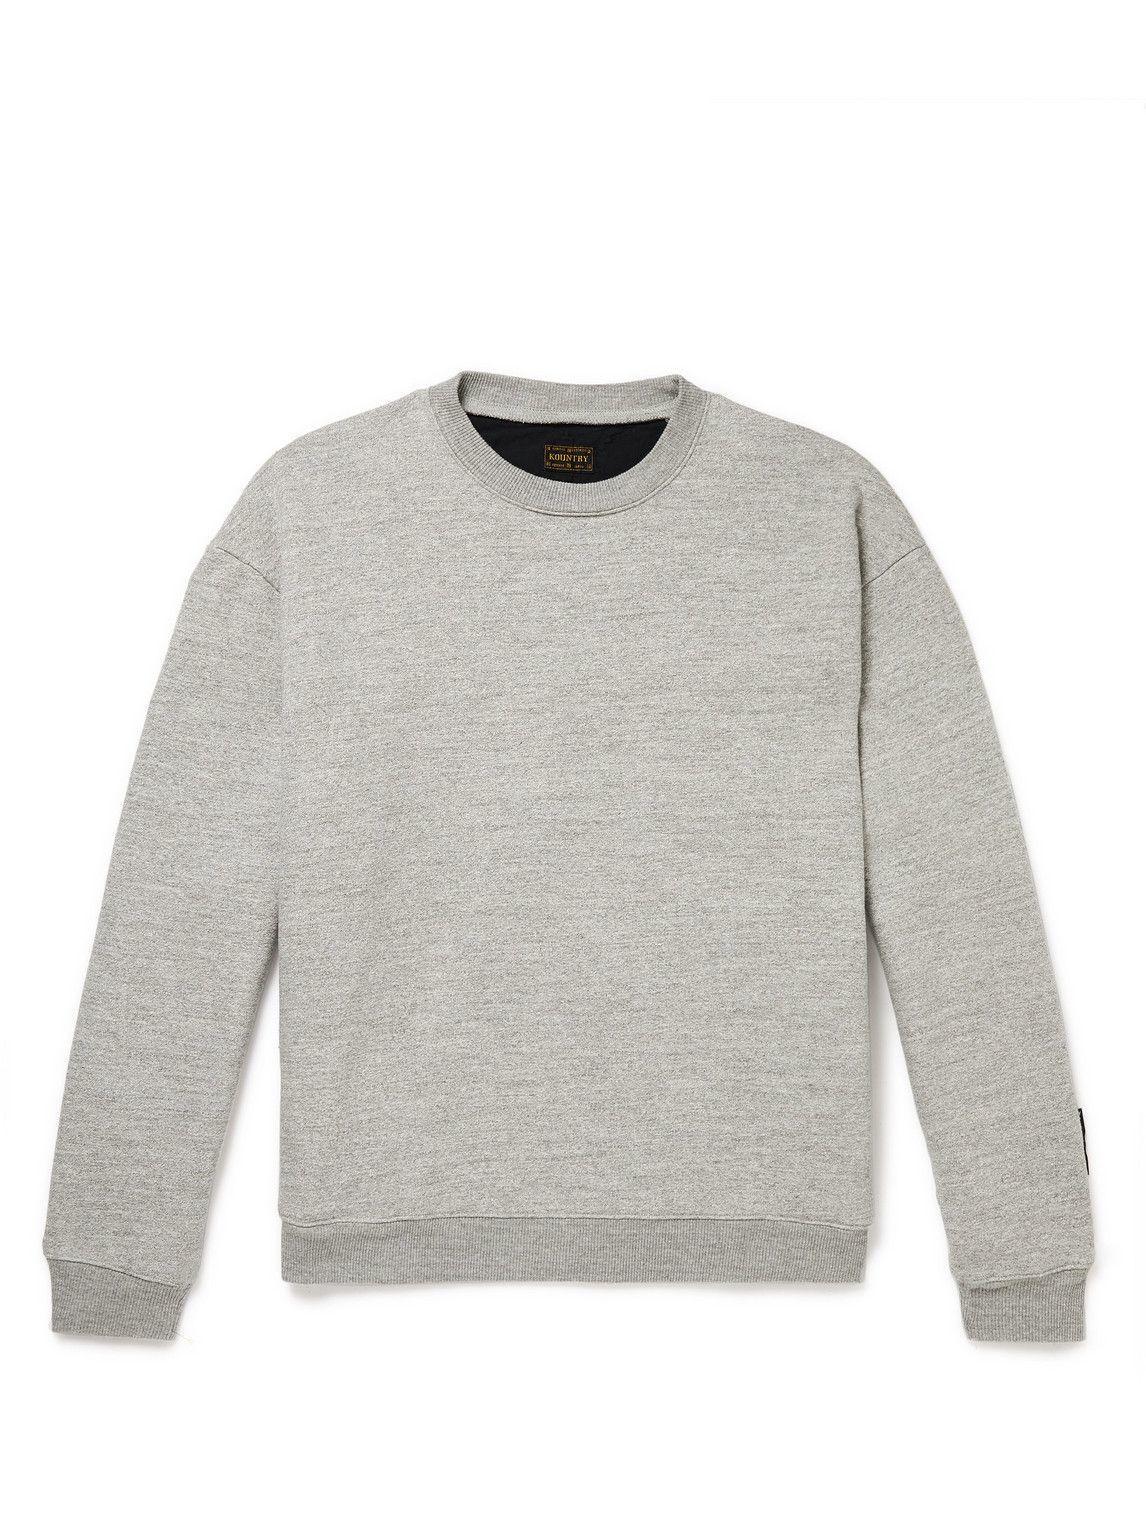 Photo: KAPITAL - Patchwork Cotton-Jersey Sweatshirt - Gray